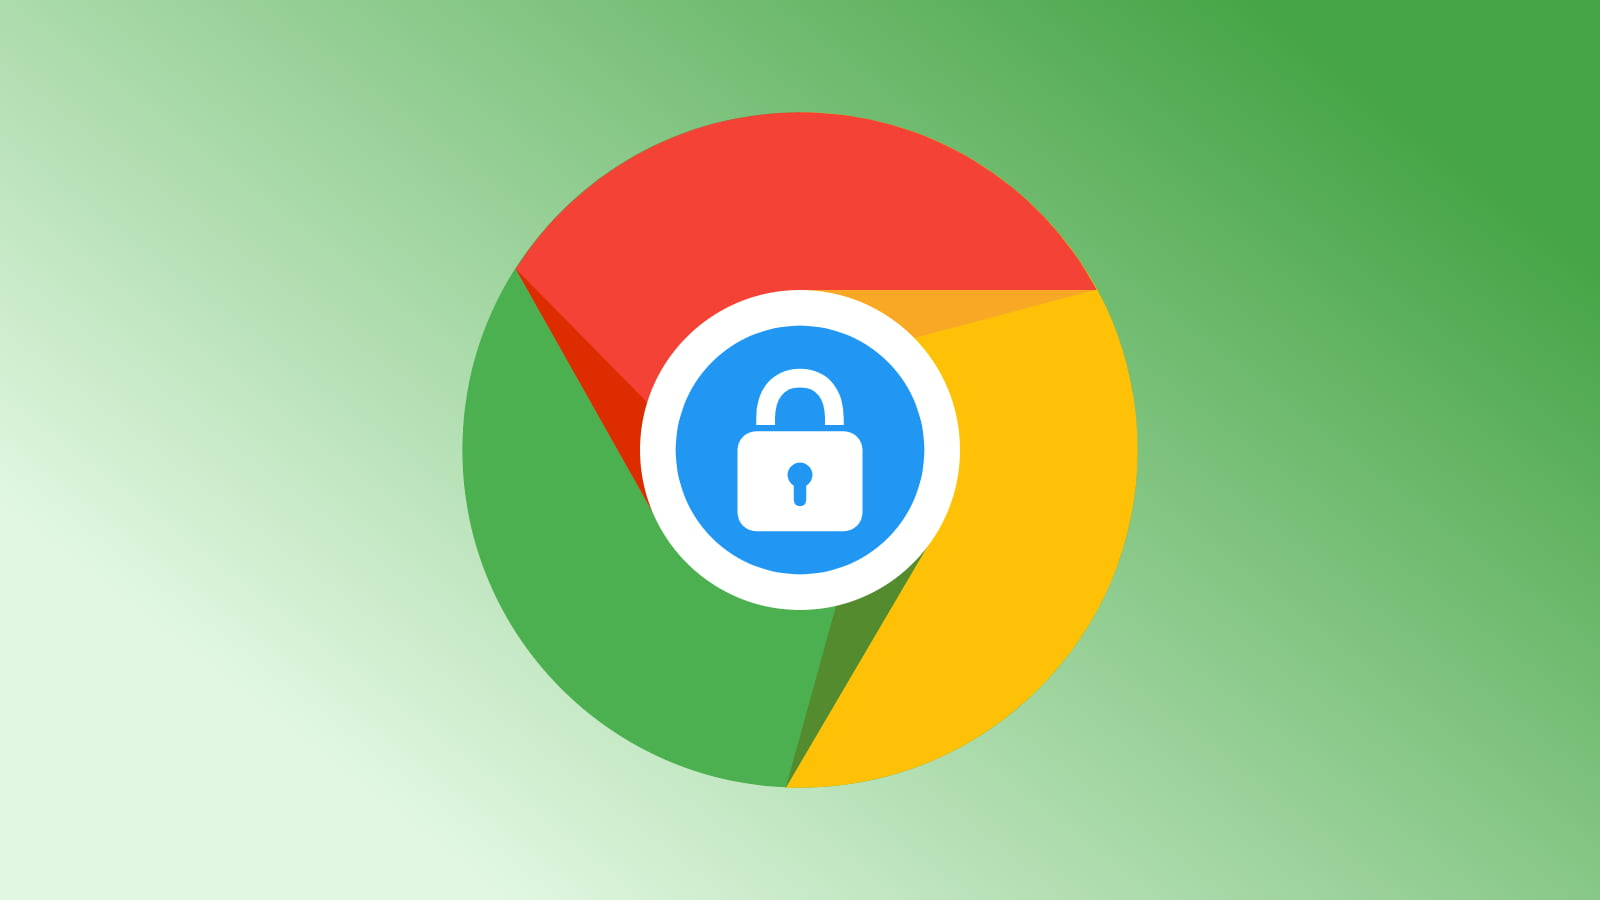 Google Chrome又双叒叕更新了:将全面阻止非HTTPS混合内容